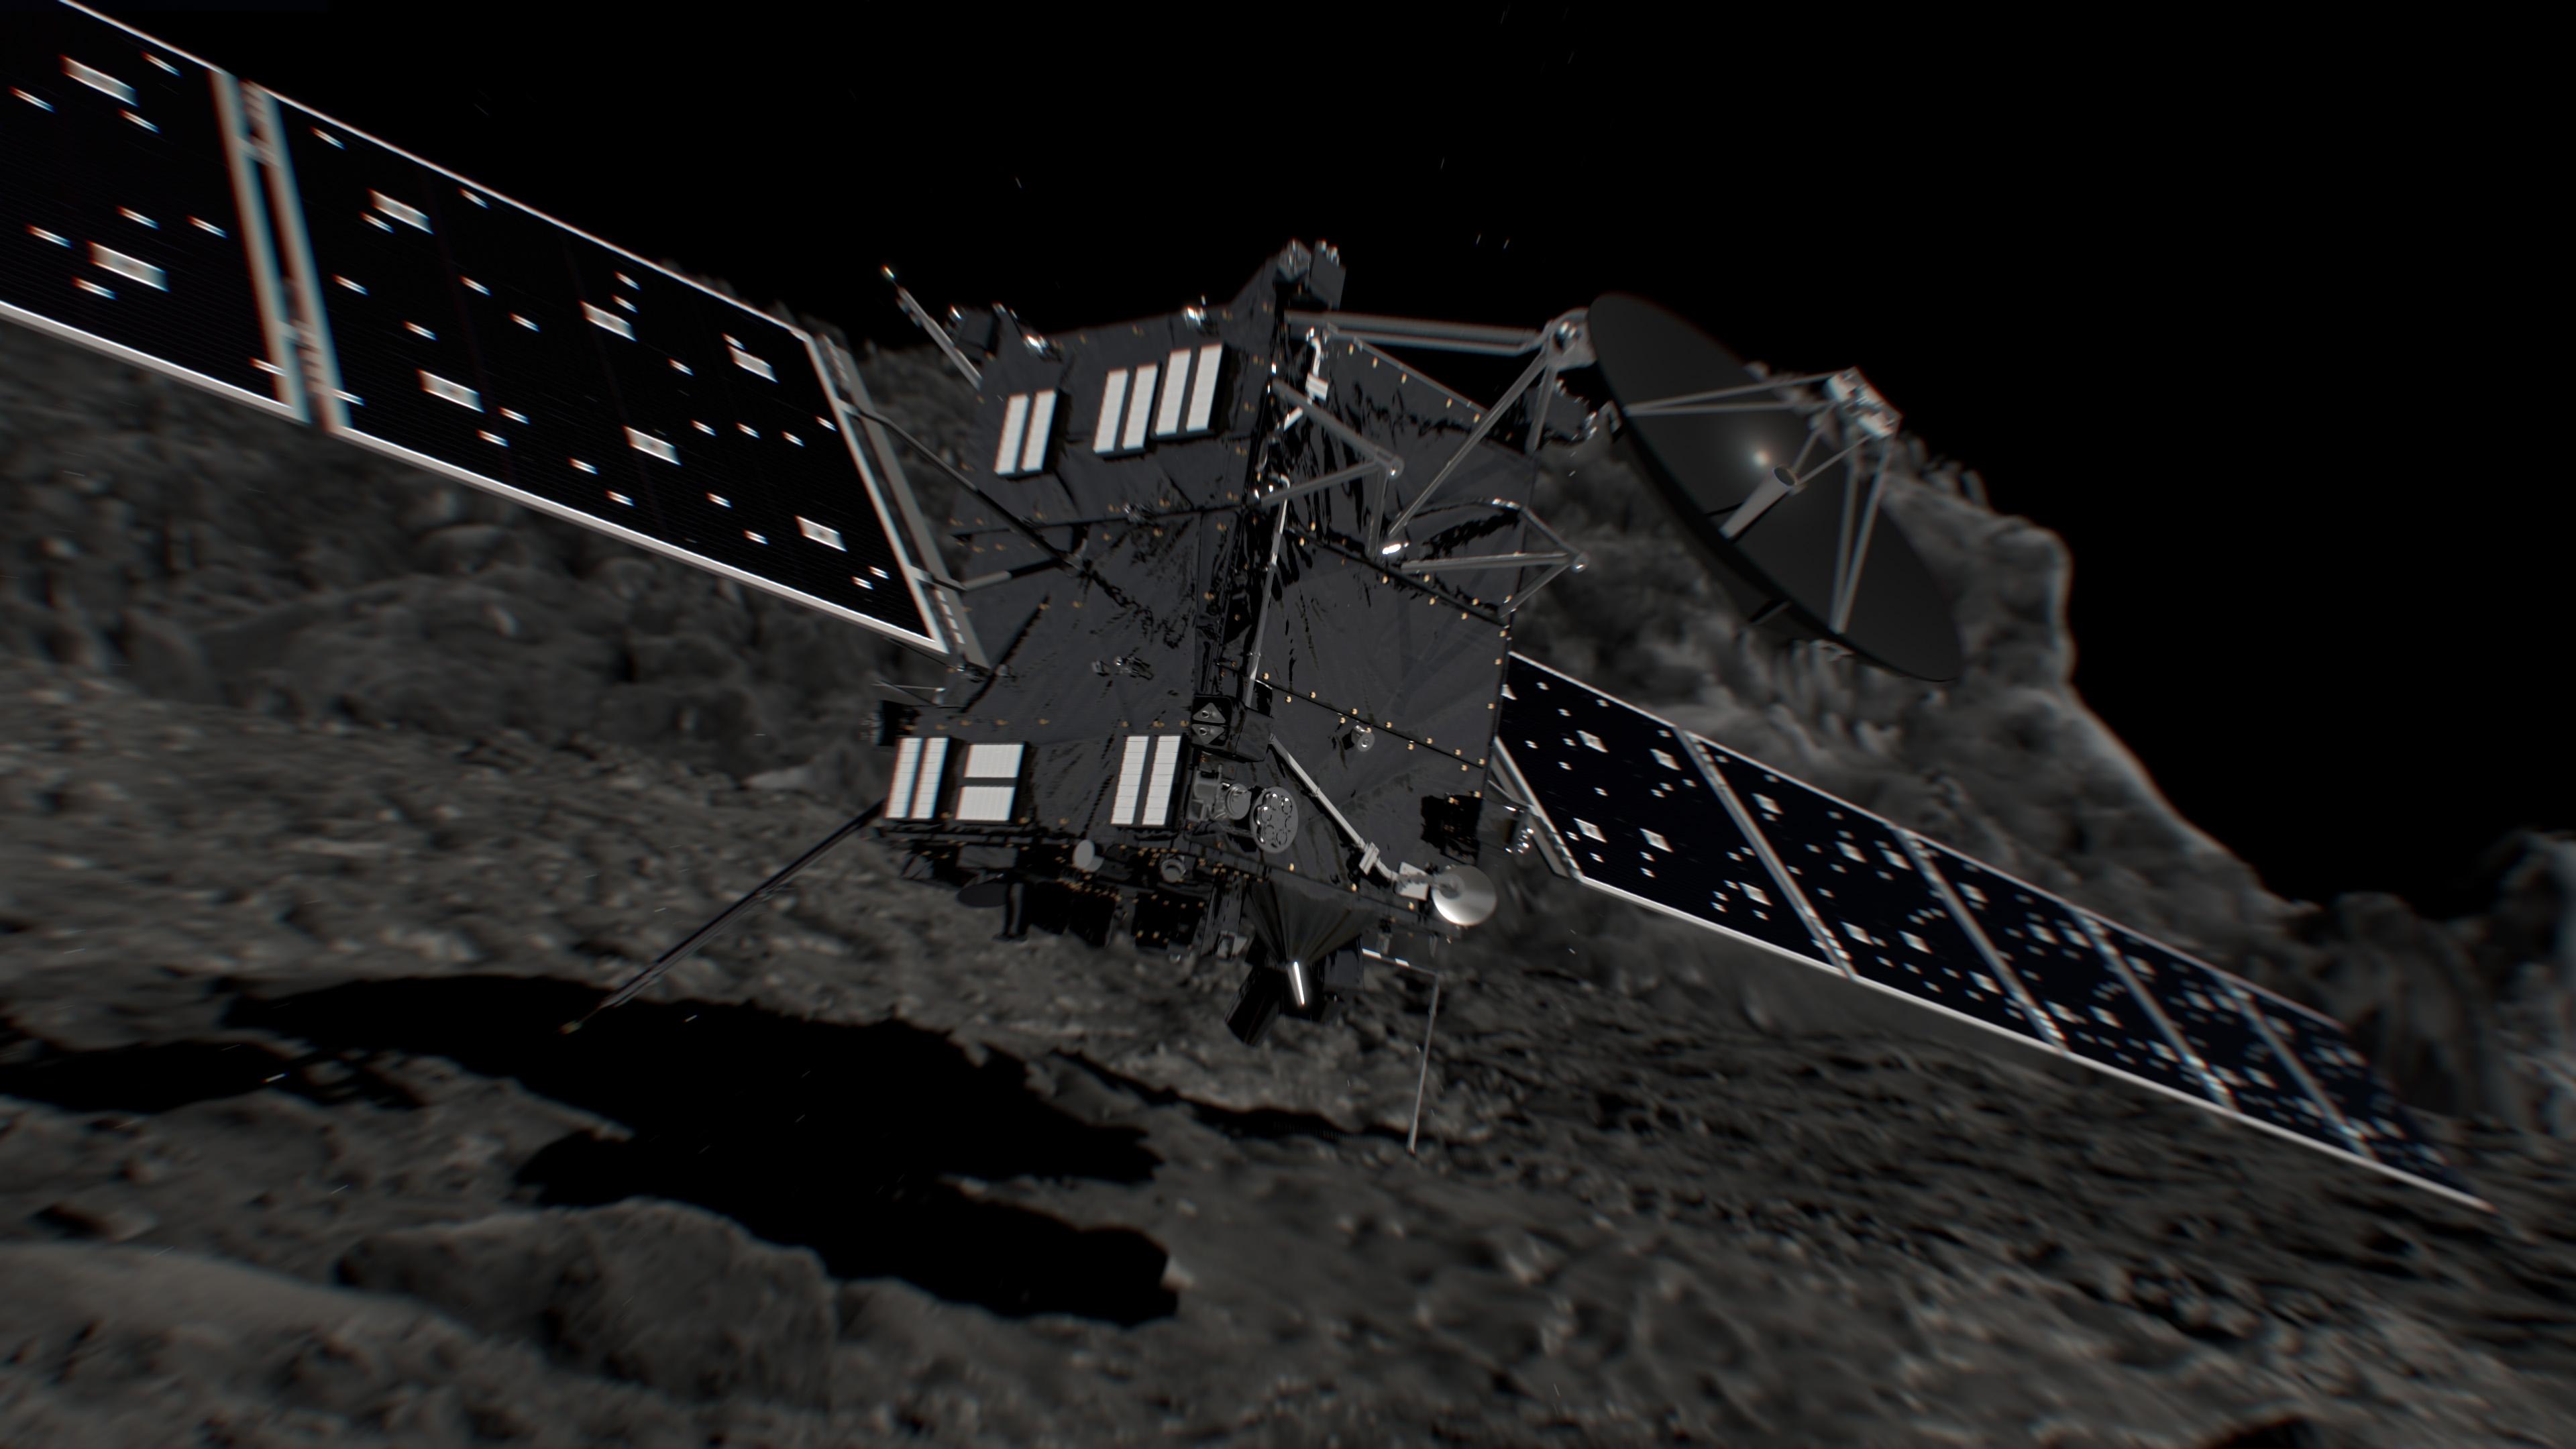 Rosetta Impact on Comet 67P: Artist's Illustration